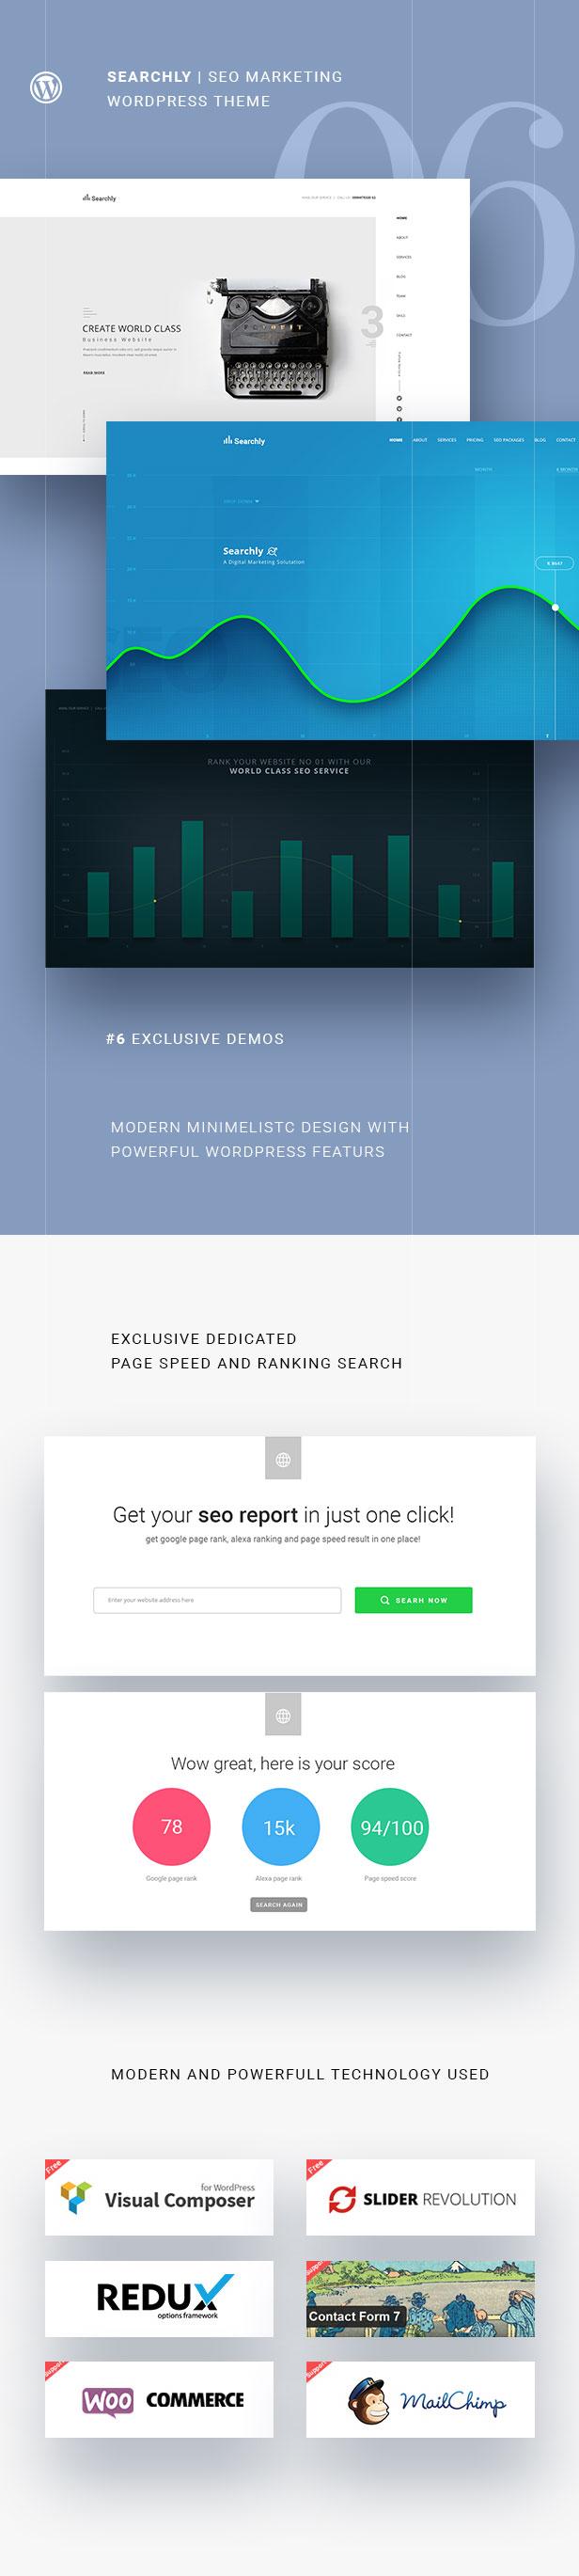 Searchly | SEO Marketing WordPress Theme - 4